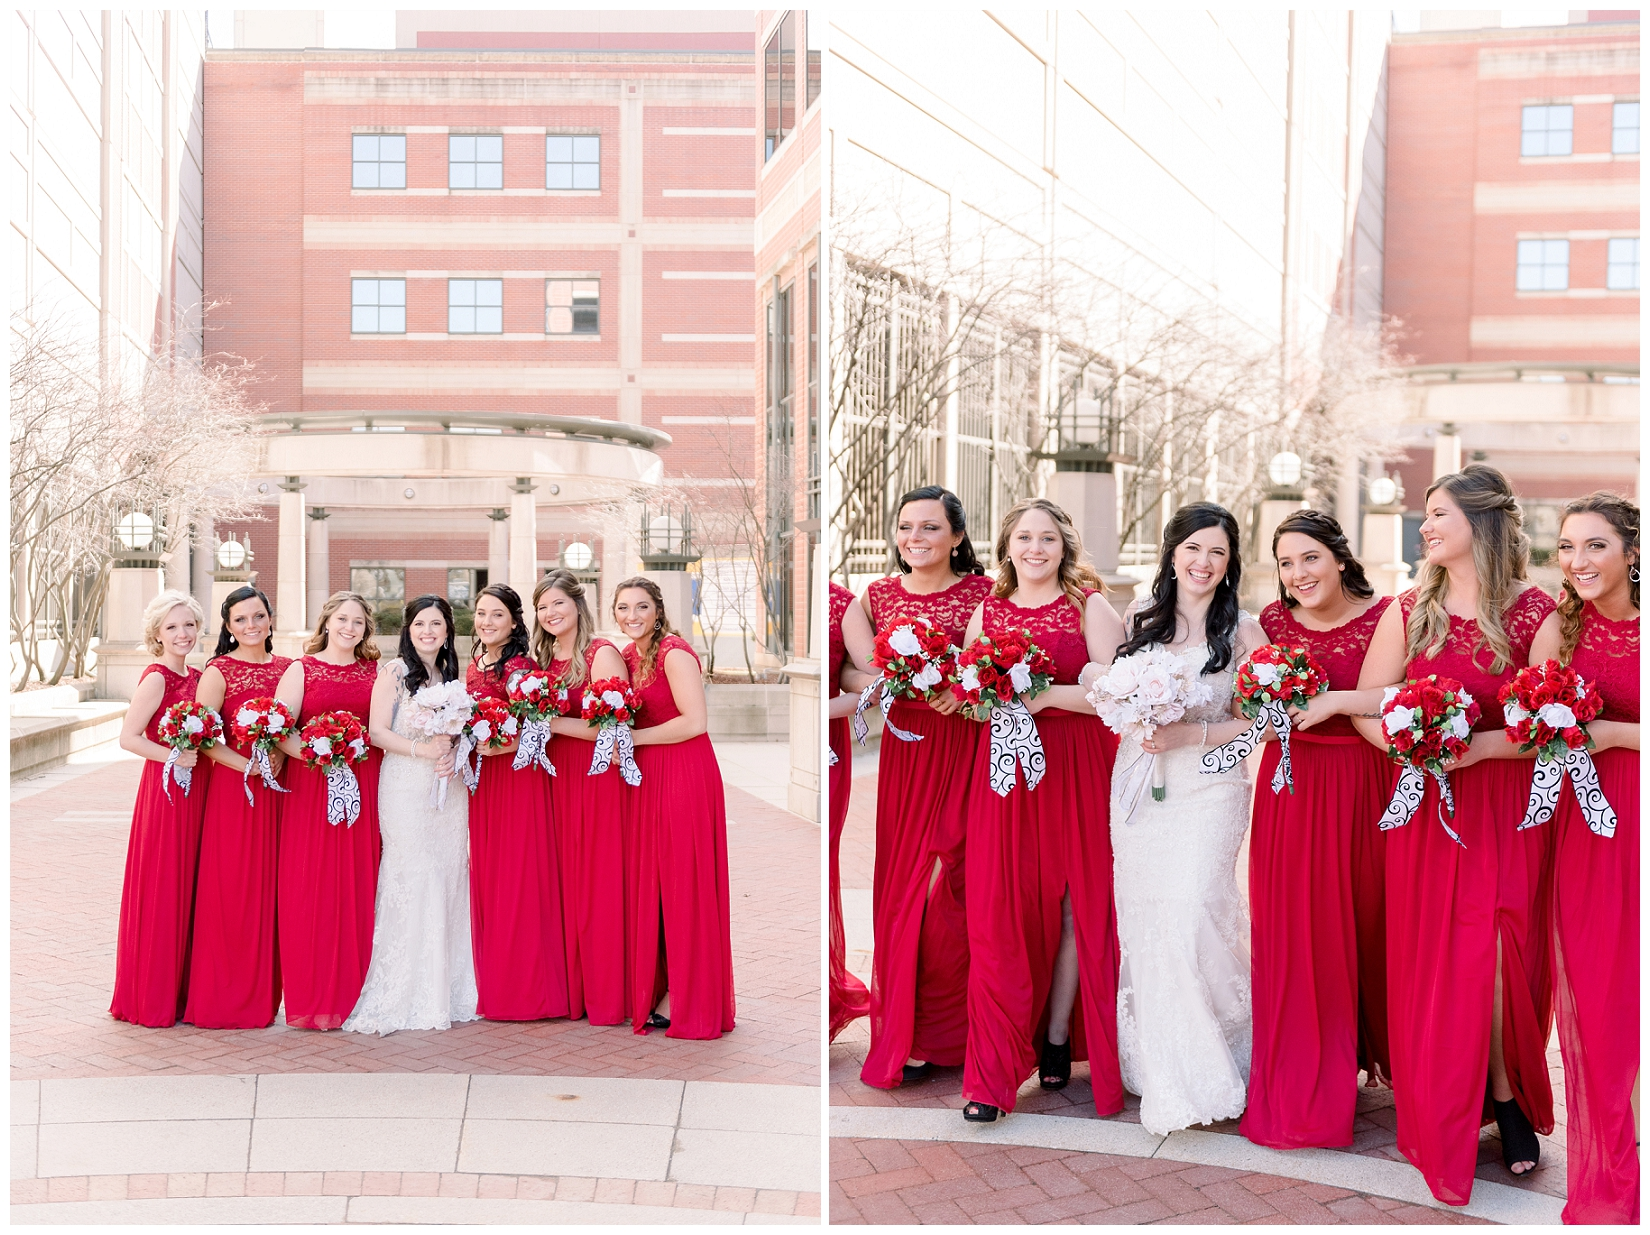 cat-alkire-wedding-photographer-indiana-chicago-indianapolis-fort-wayne_1098.jpg